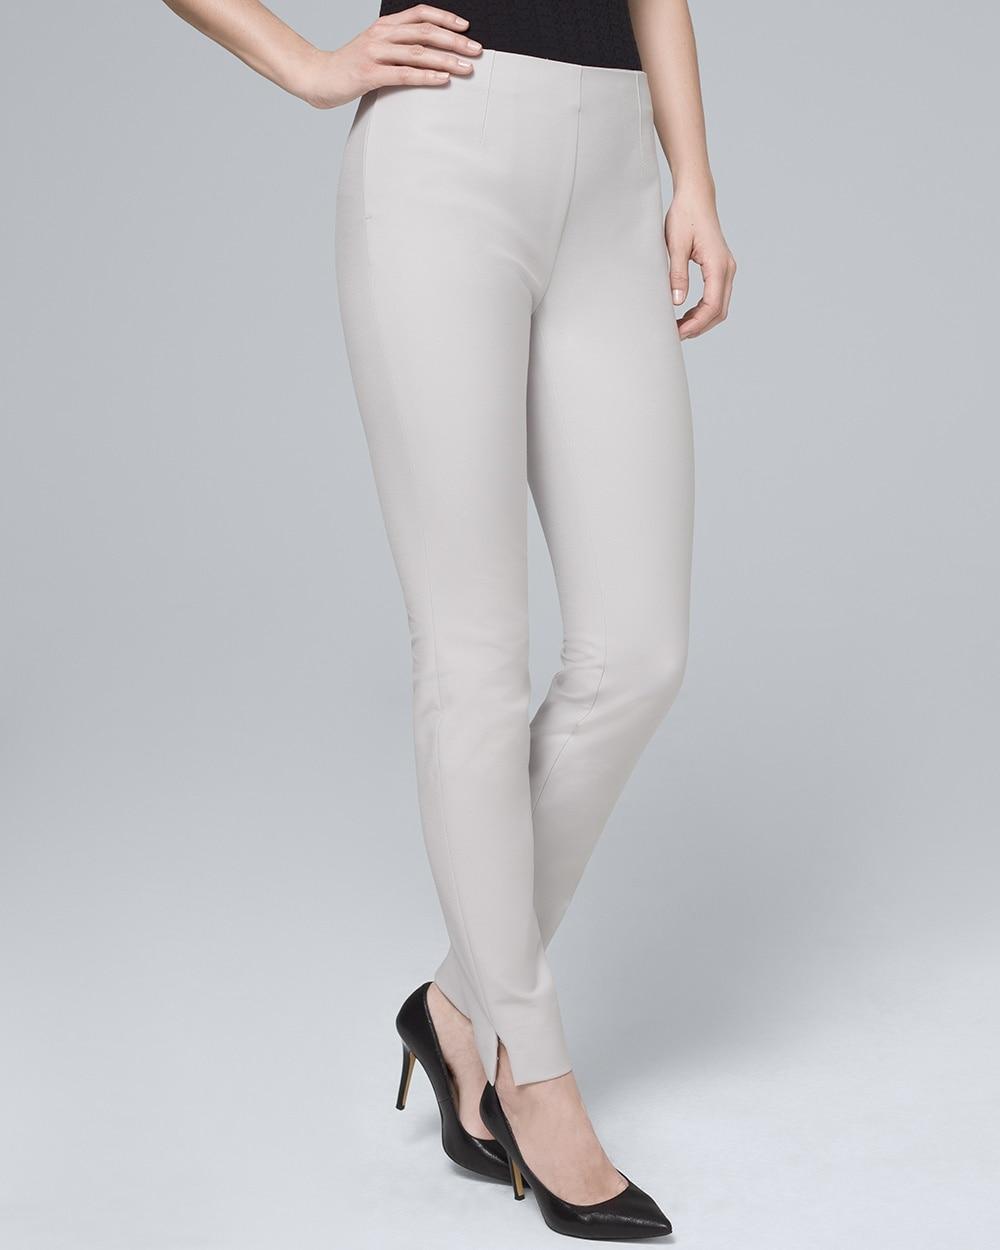 9c94fa1db0b9fd Shop Slim & Skinny Pants for Women - White House Black Market